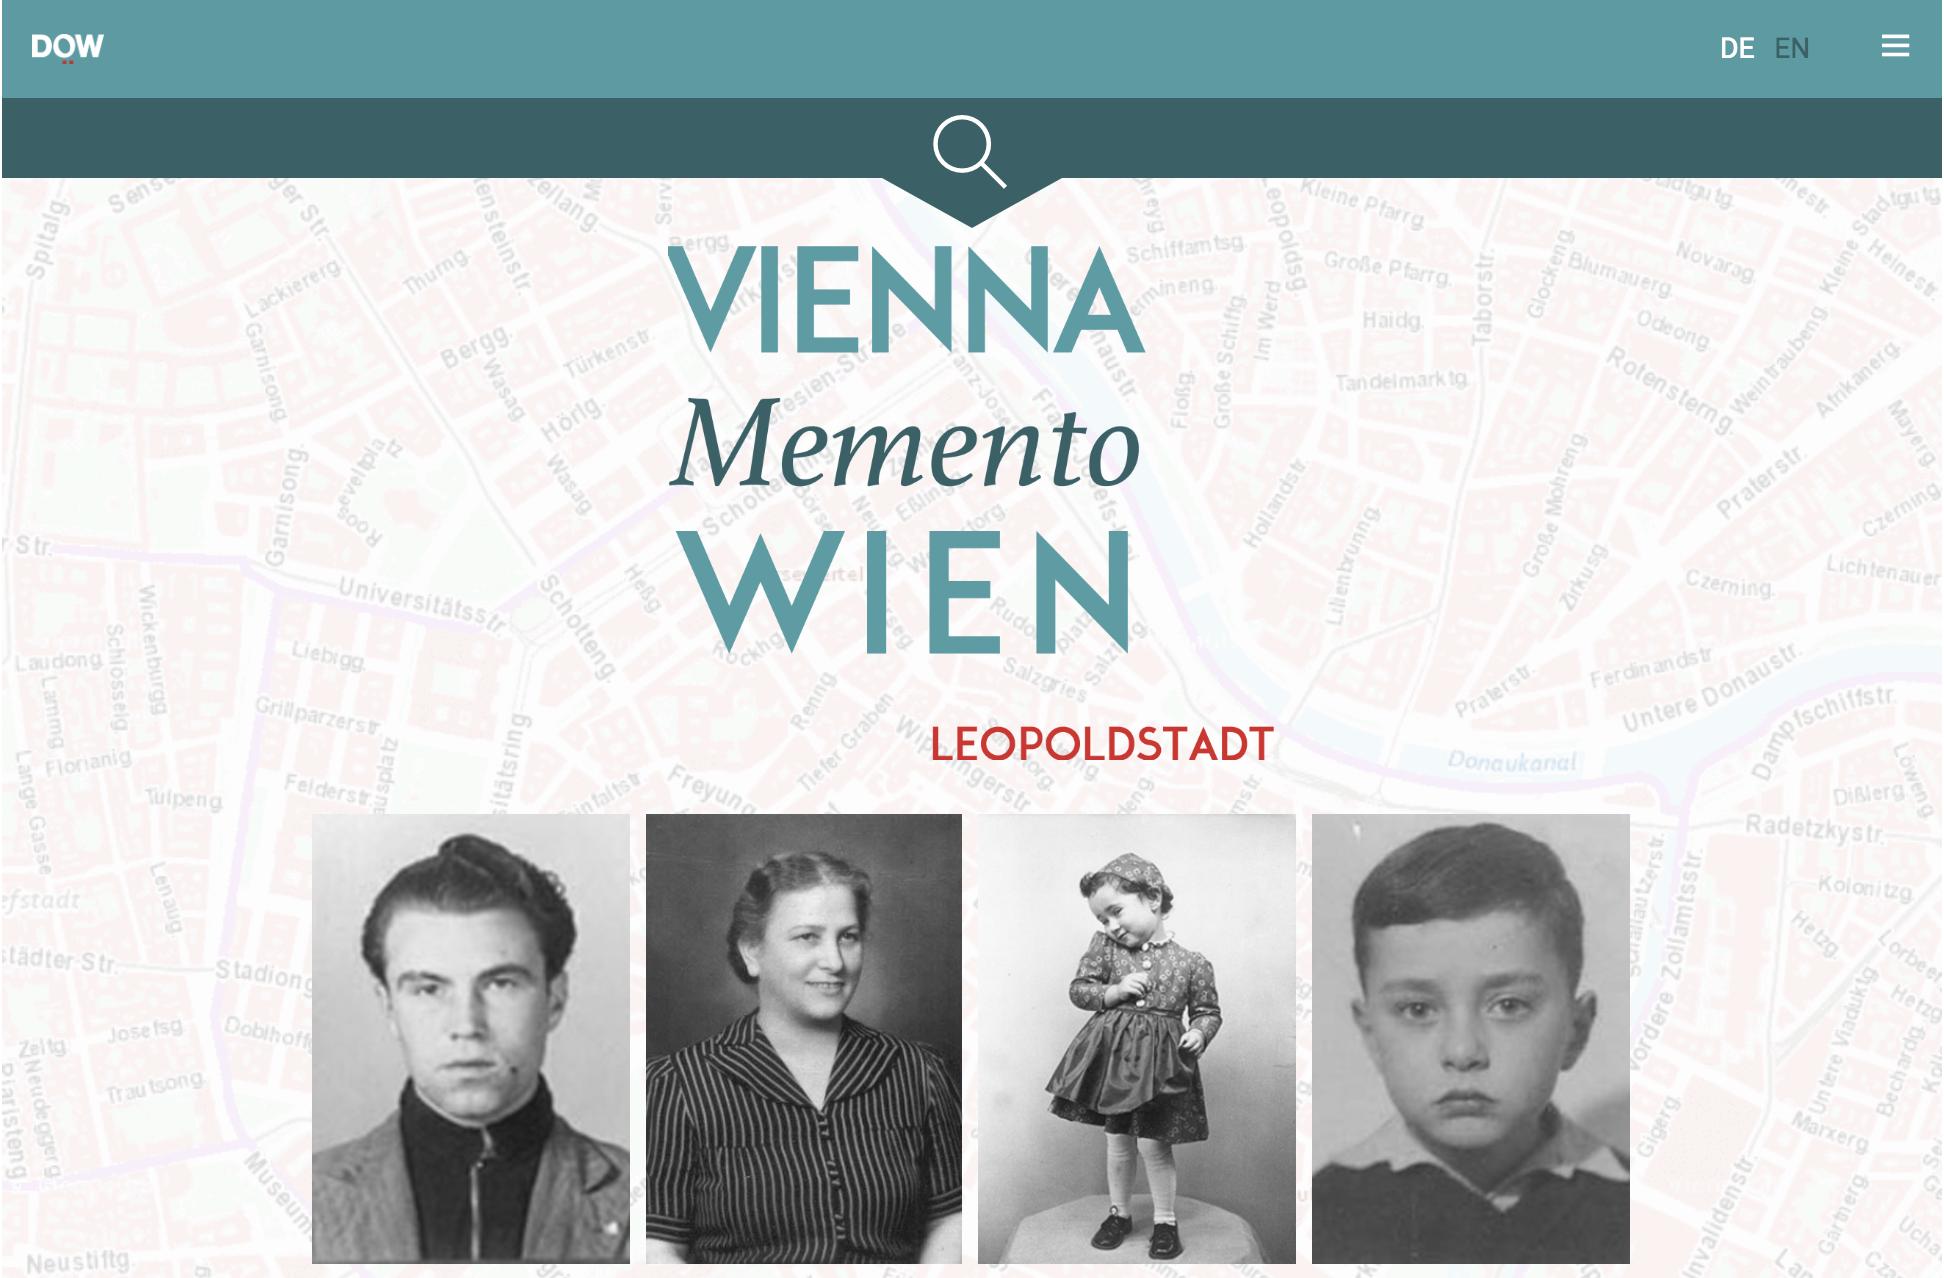 Memento Wien Lopoldstadt (Screenshot Startseite)